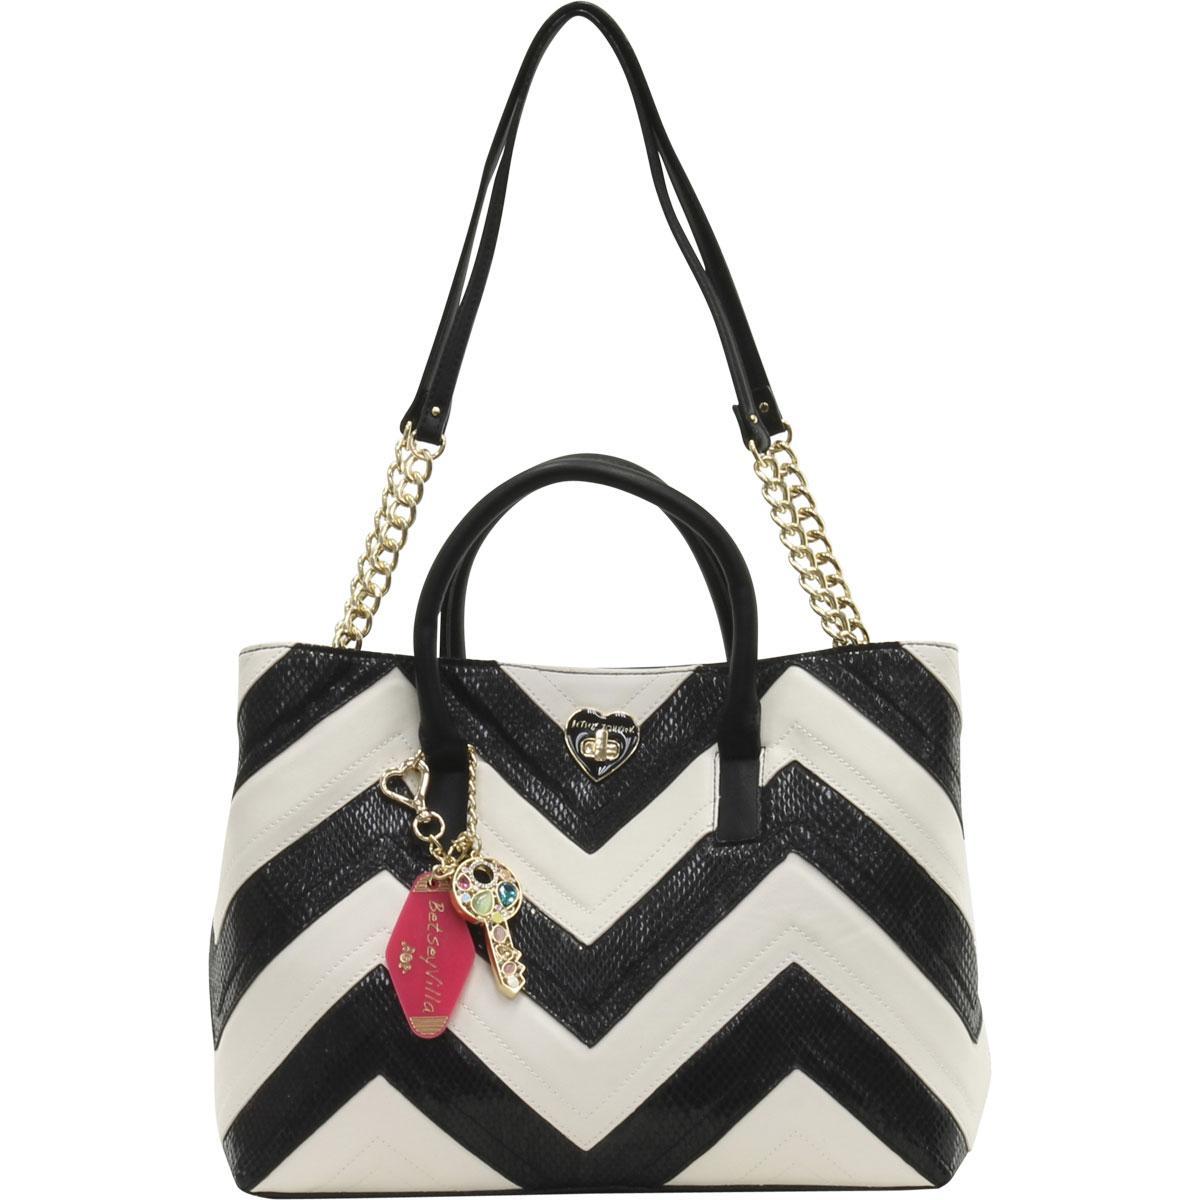 993e8a90db84 Betsey Johnson Women s Suite Life Chevron Tote Handbag